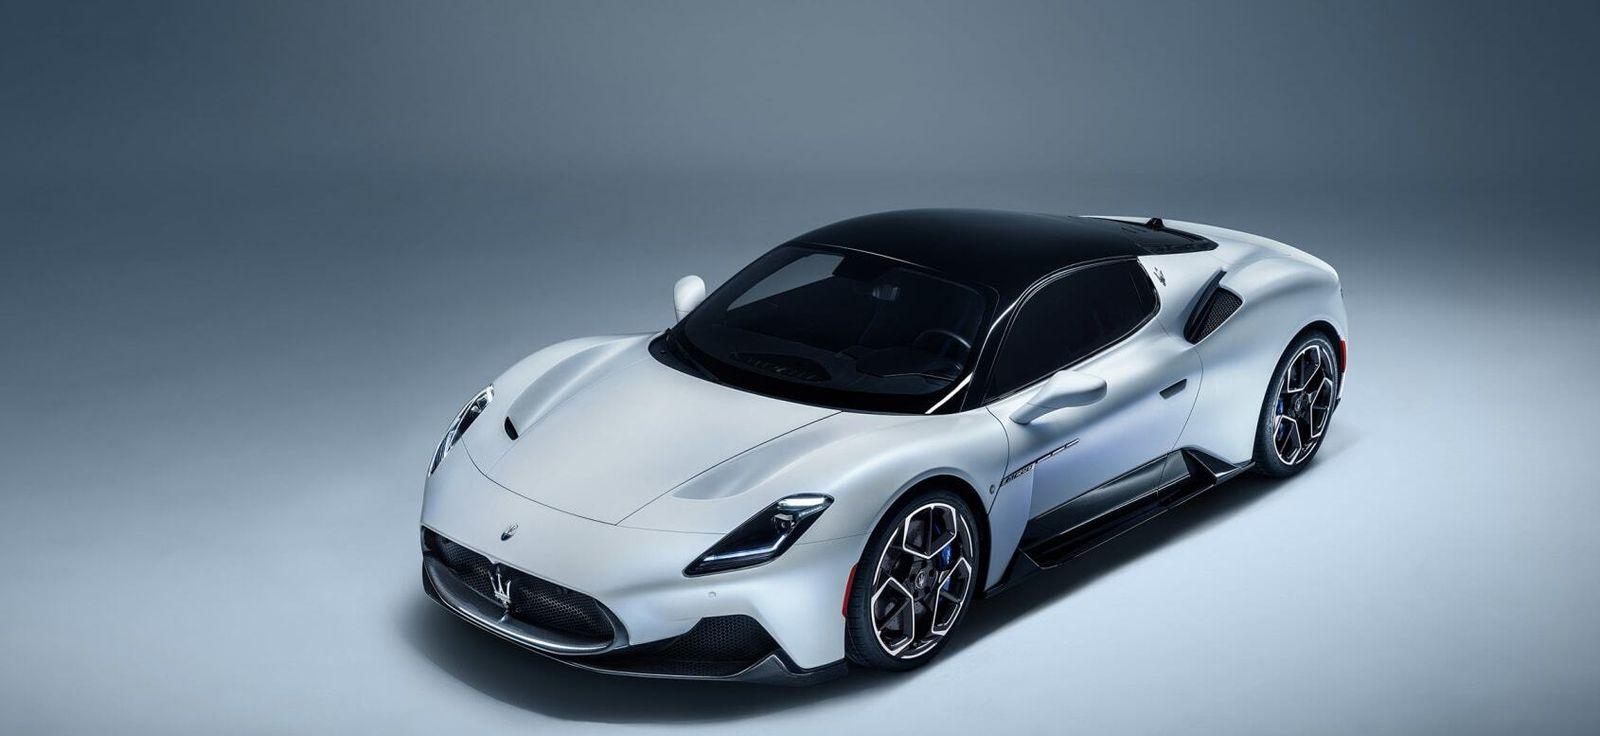 Maserati MC20 super car equipped with Sonus faber amplified audio